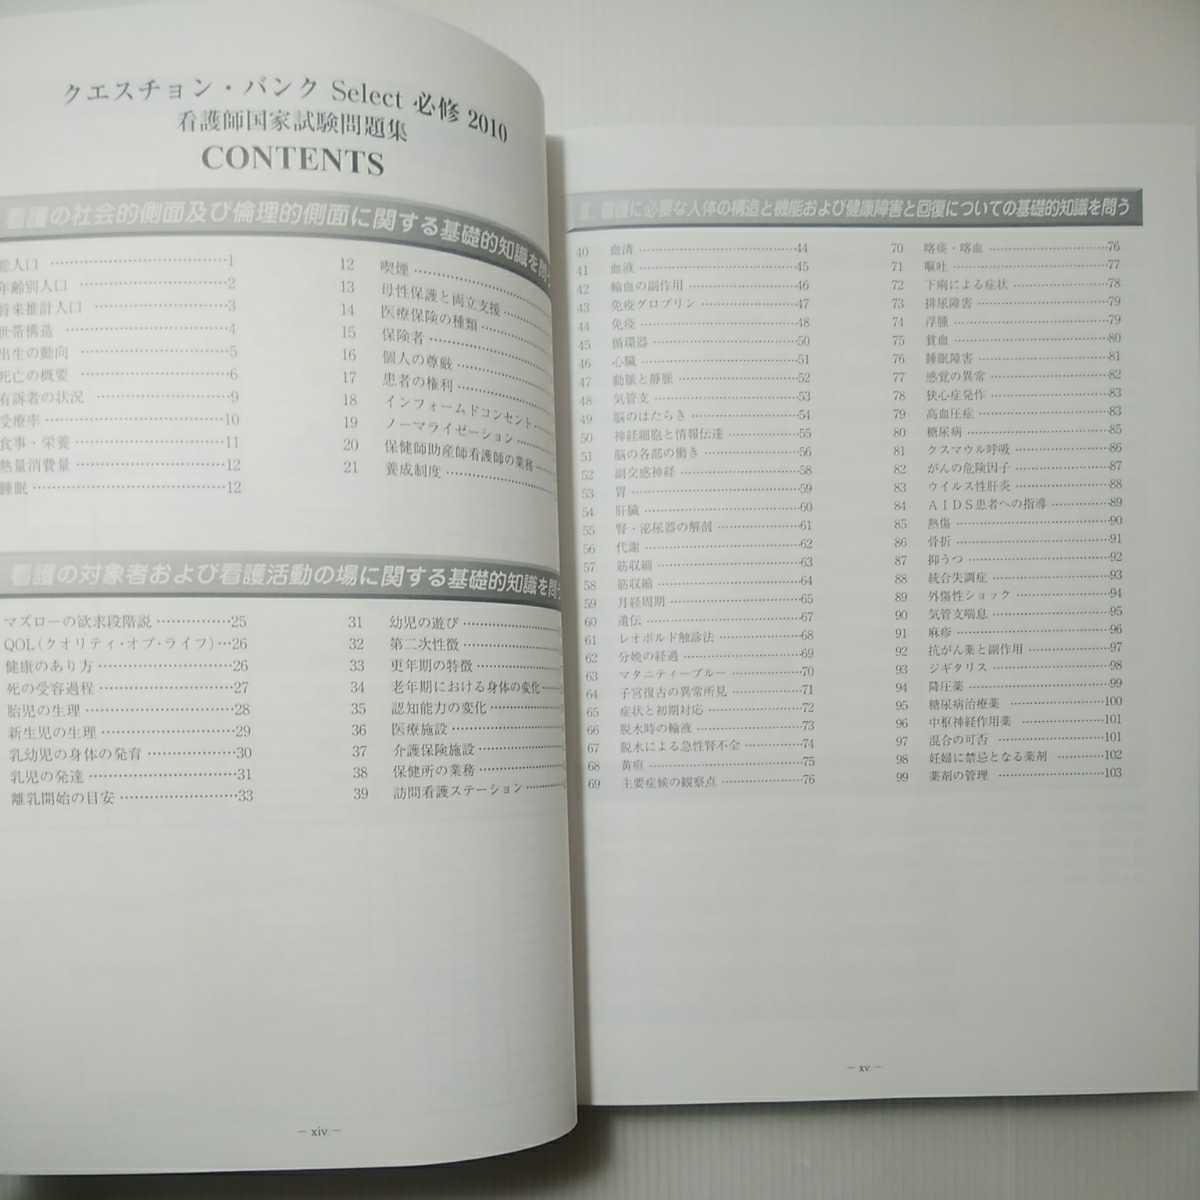 zaa-072♪クエスチョン・バンクSelect必修 2010―看護師国家試験問題集 (日本語) 単行本 2009/7/1 医療情報科学研究所 (著)